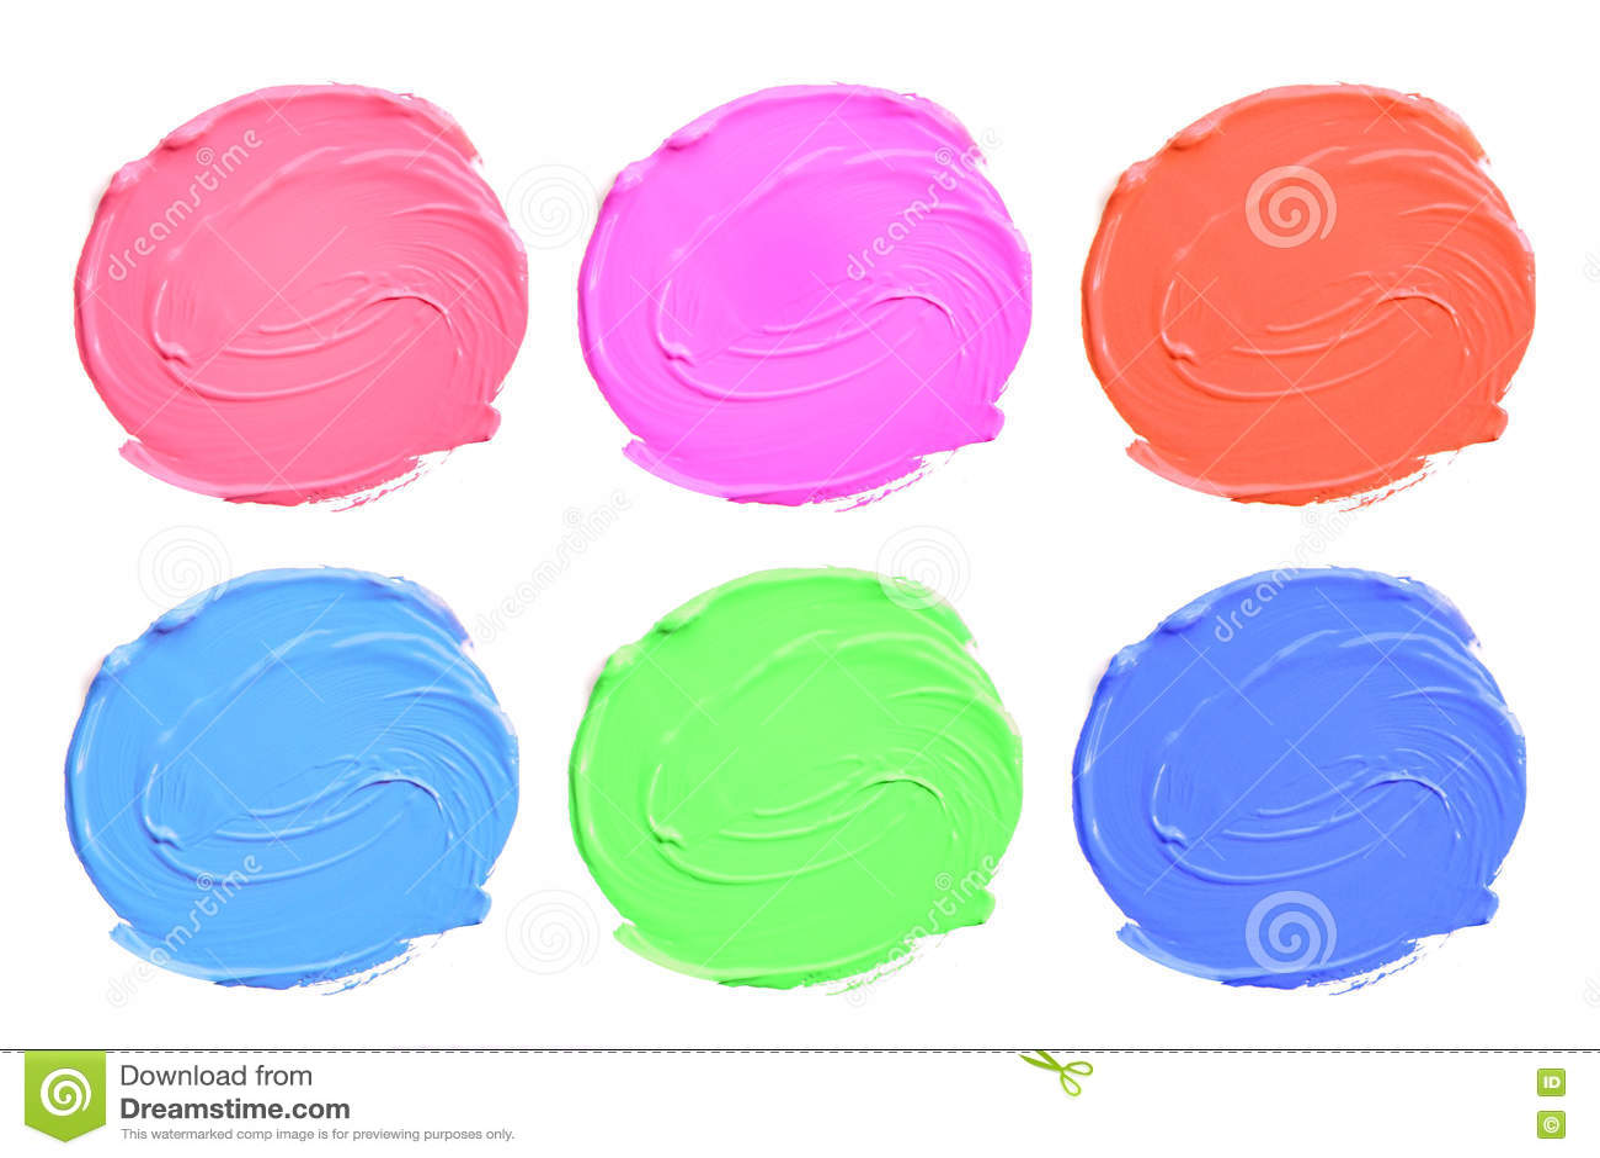 Set of colorful acrylic blots isolate on white.